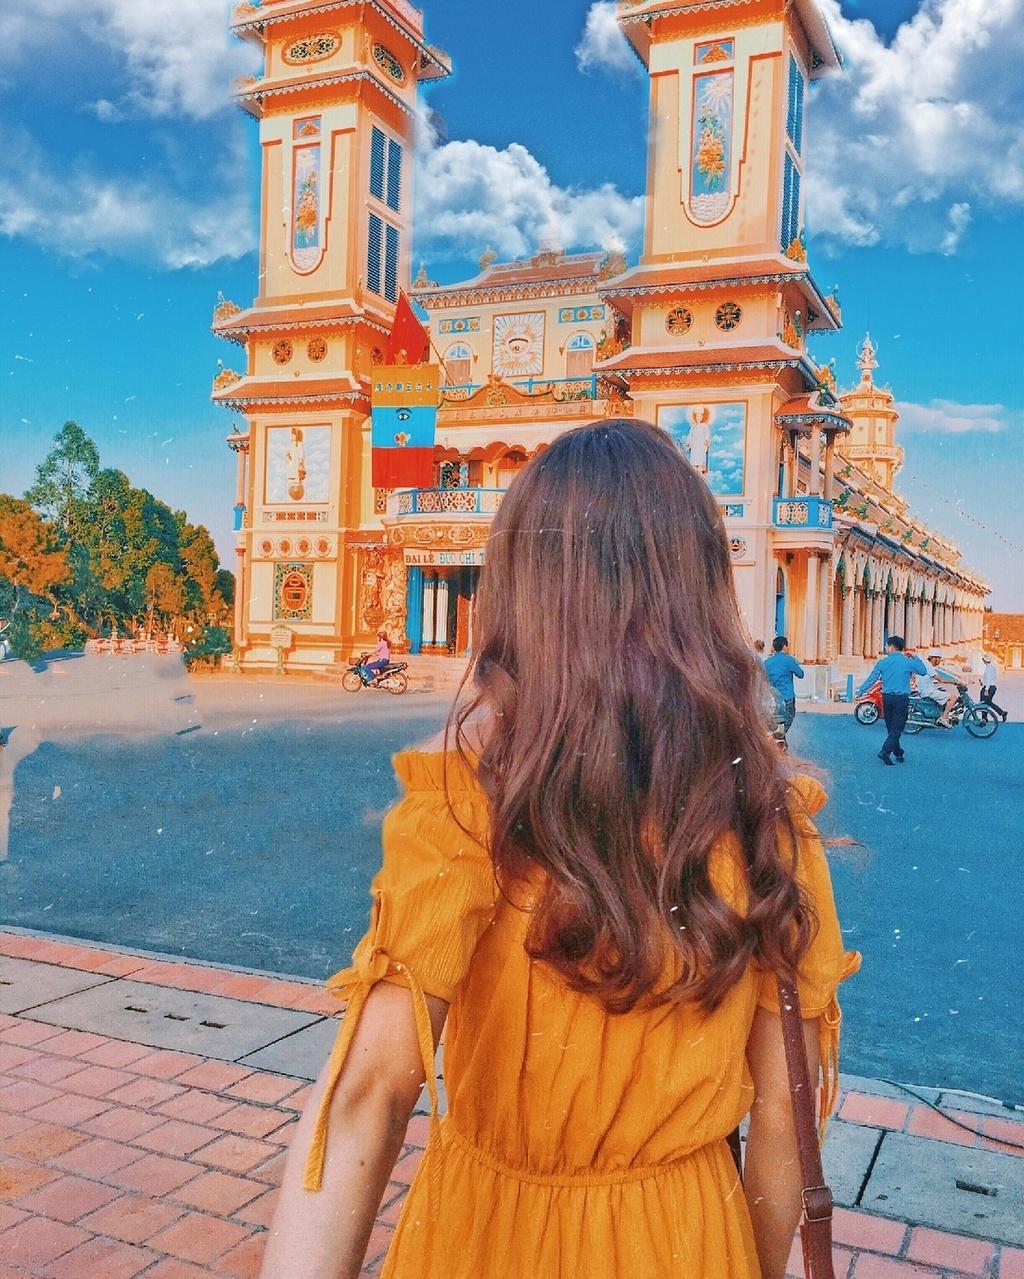 Ho da Ma Thien Lanh va nhung diem check-in khong the bo qua o Tay Ninh hinh anh 6